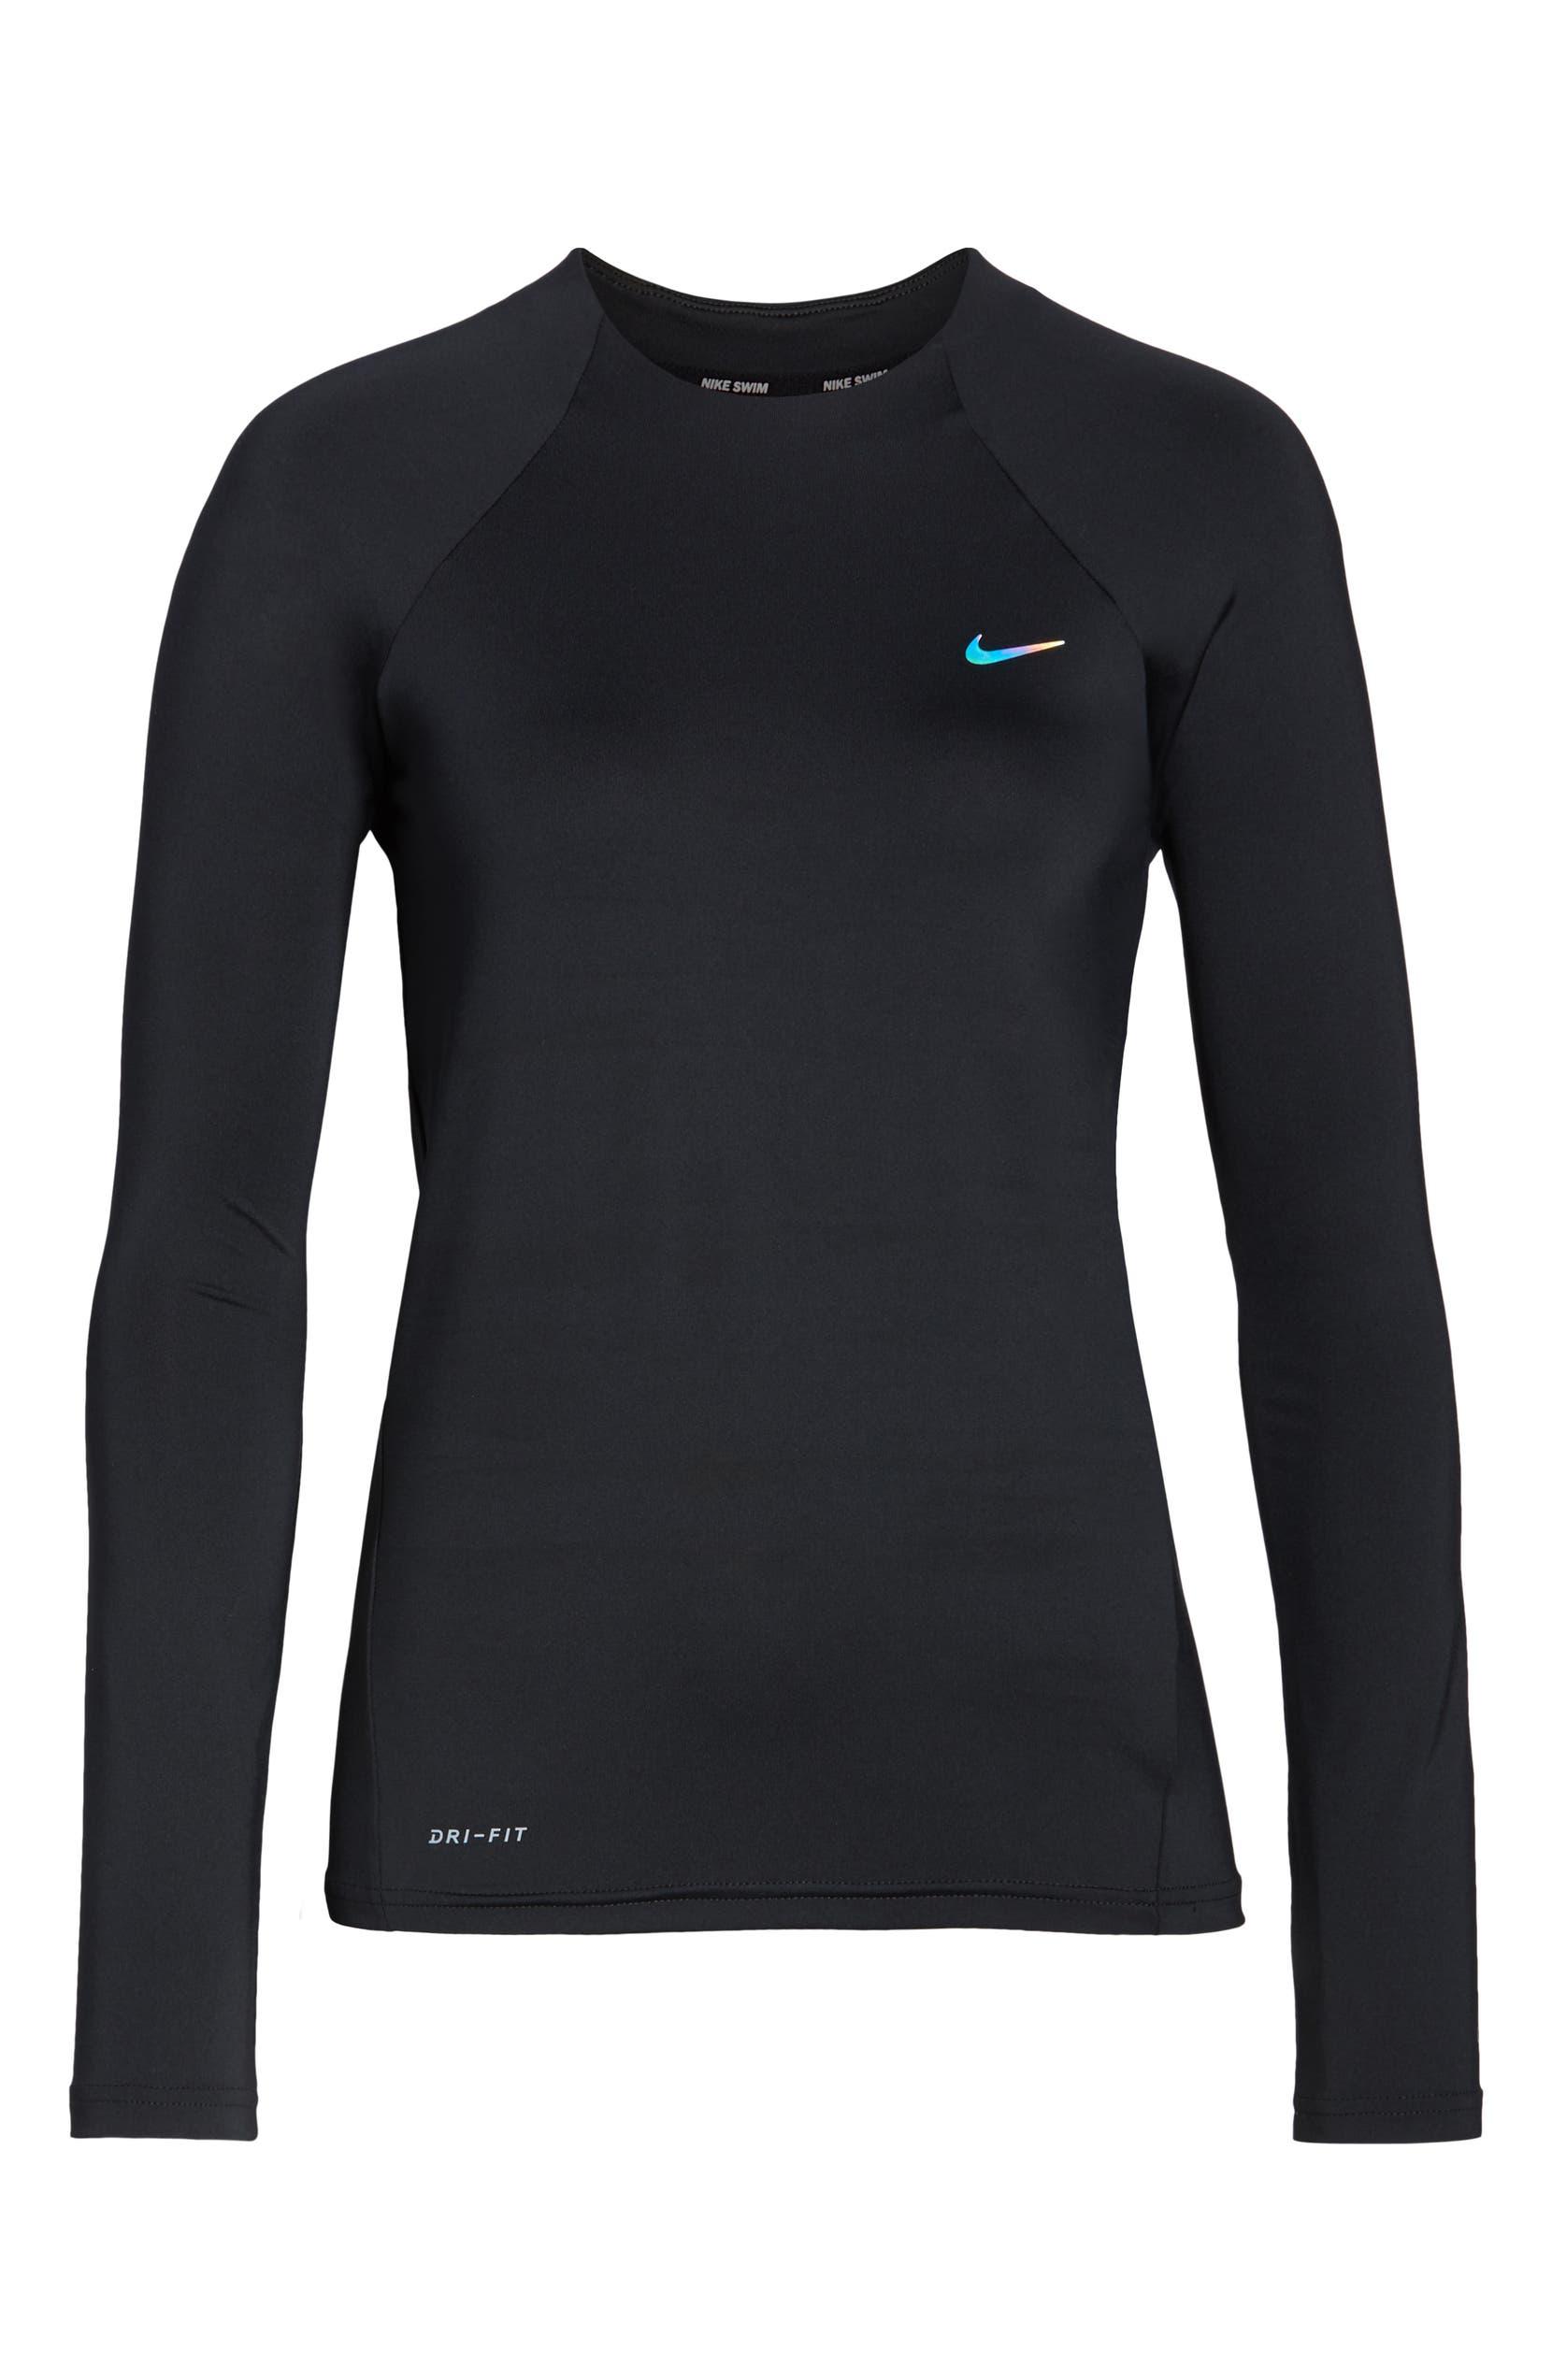 6427388fb Nike Long Sleeve Hydroguard Shirt | Nordstrom